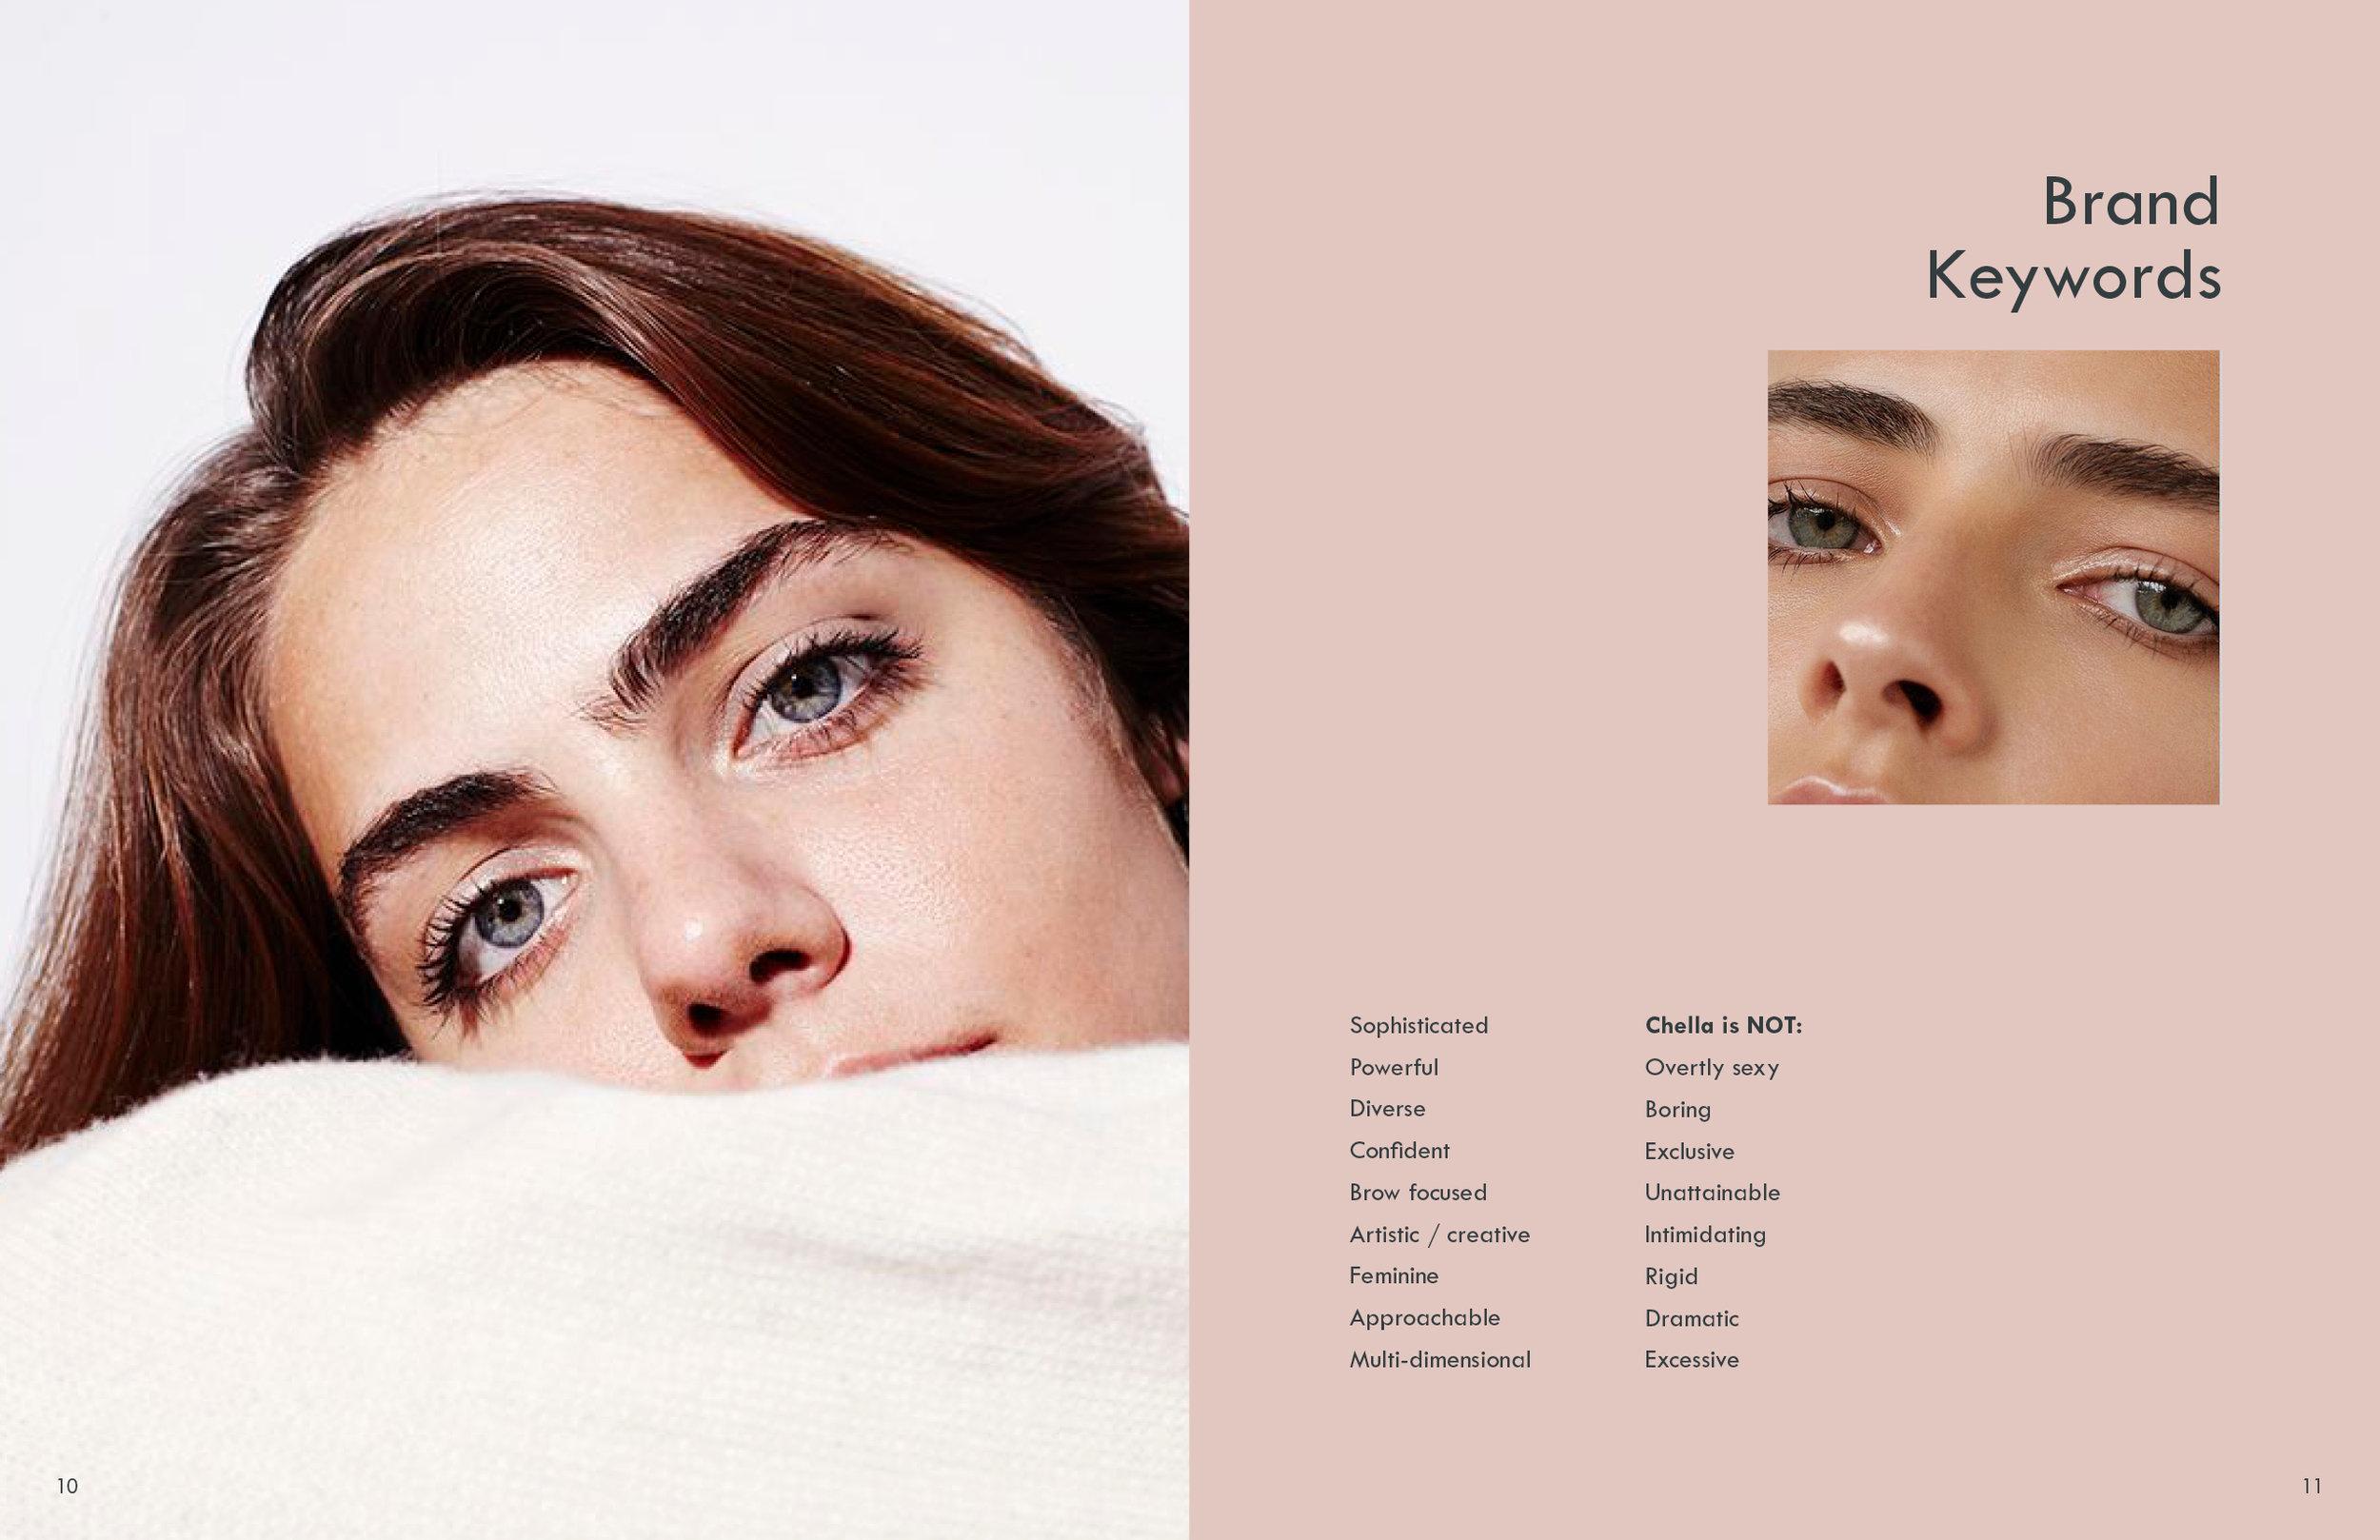 Chella Brand Book6.jpg